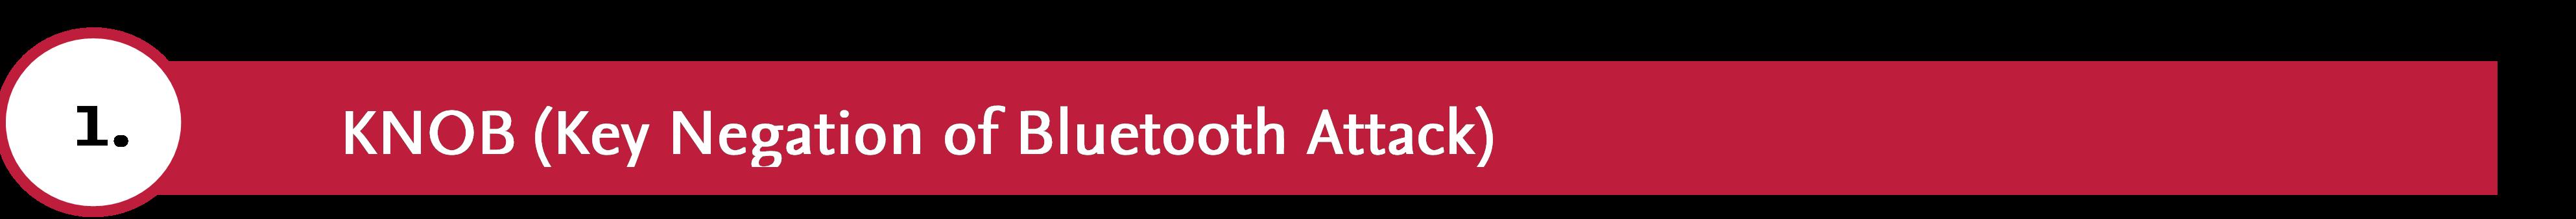 KNOB (Key Negation of Bluetooth Attack)